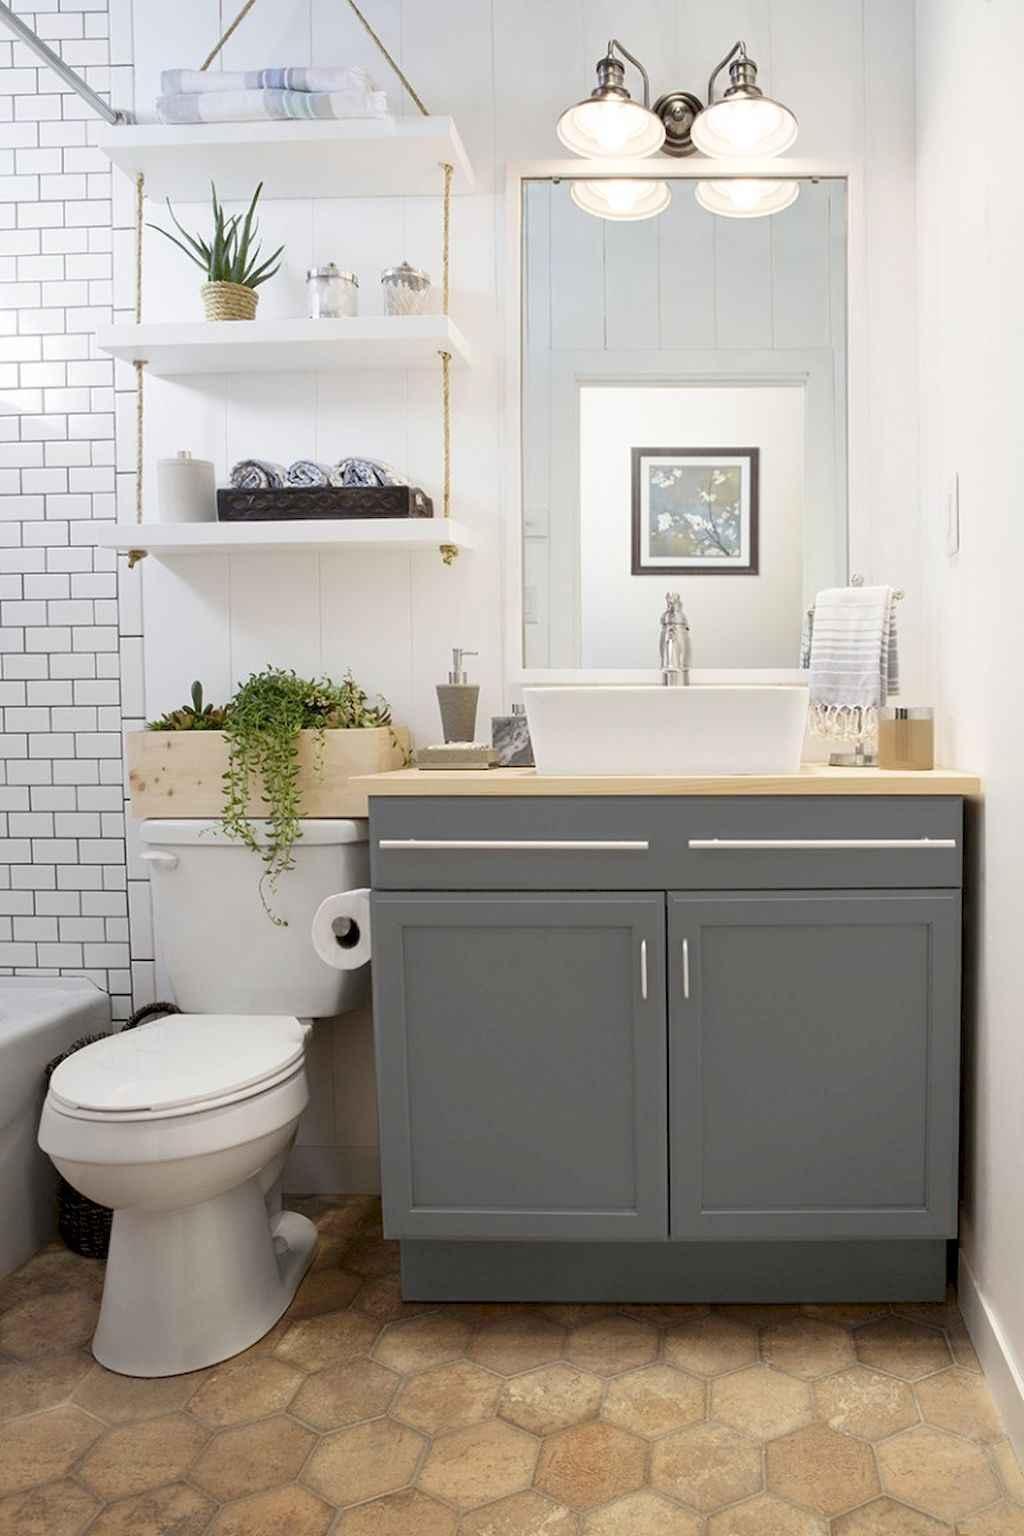 Cool bathroom storage shelves organization ideas (39)